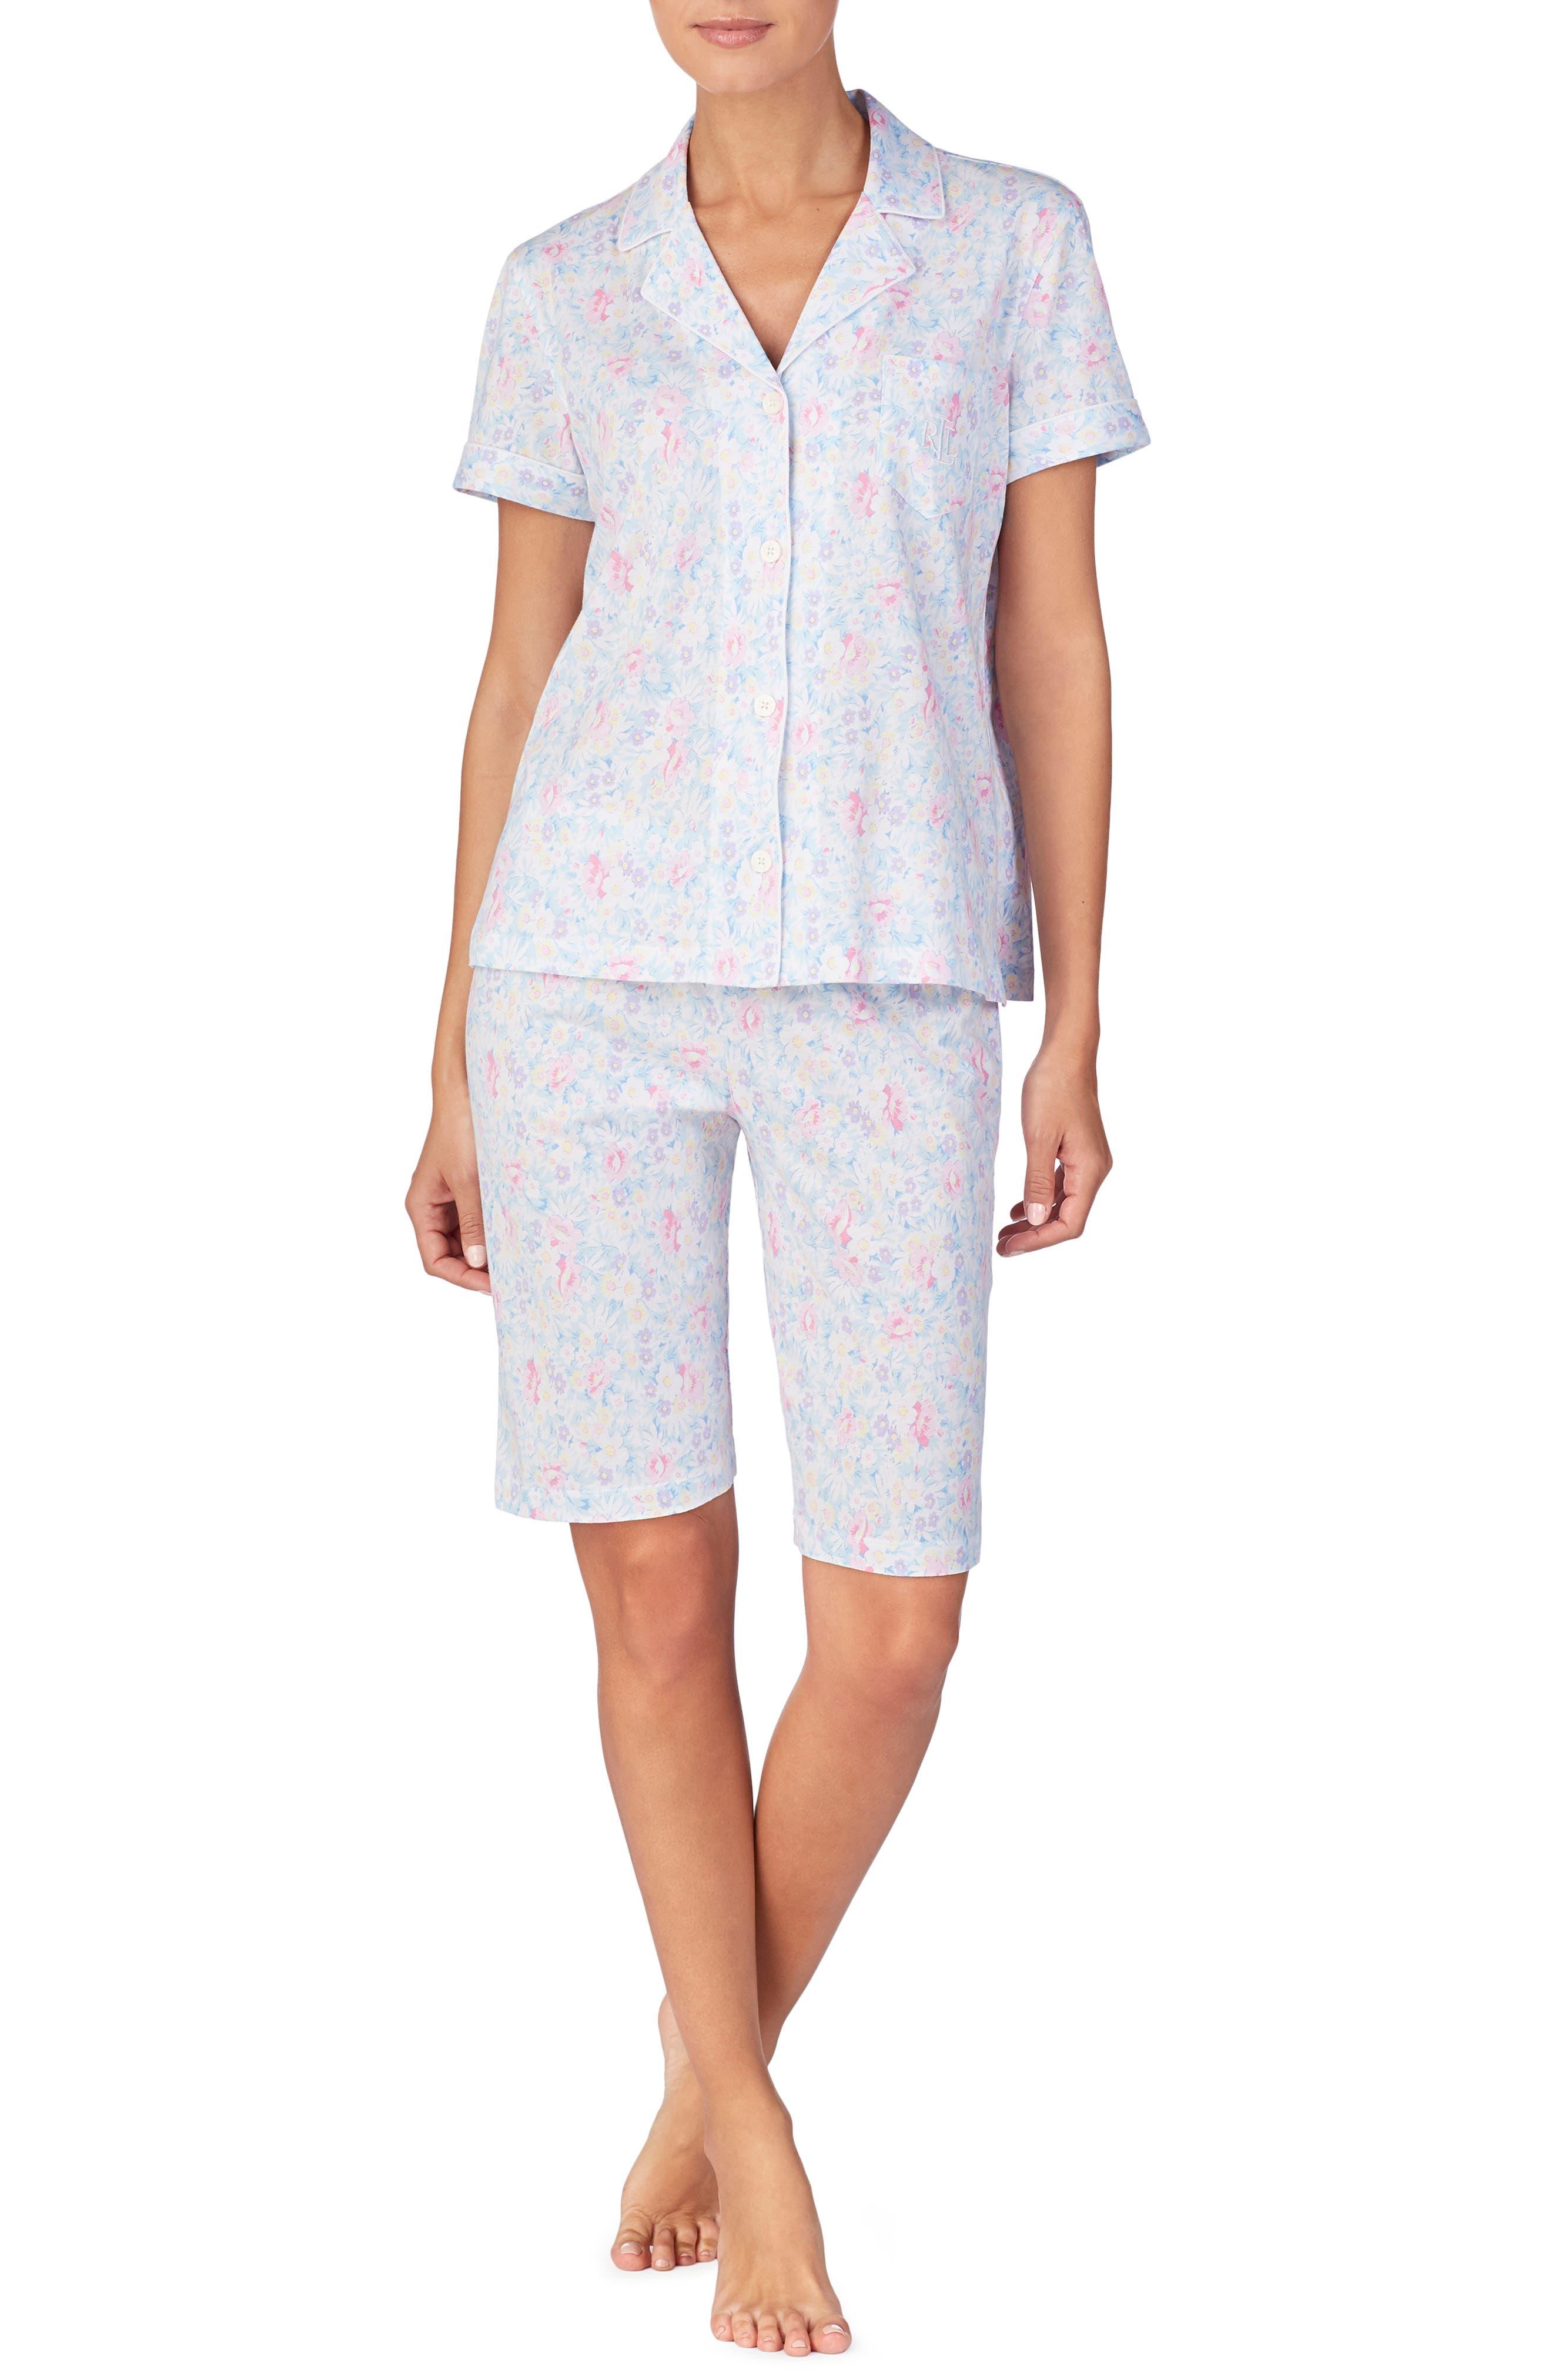 Plus Size Lauren Ralph Lauren Bermuda Shorts Pajamas, Pink